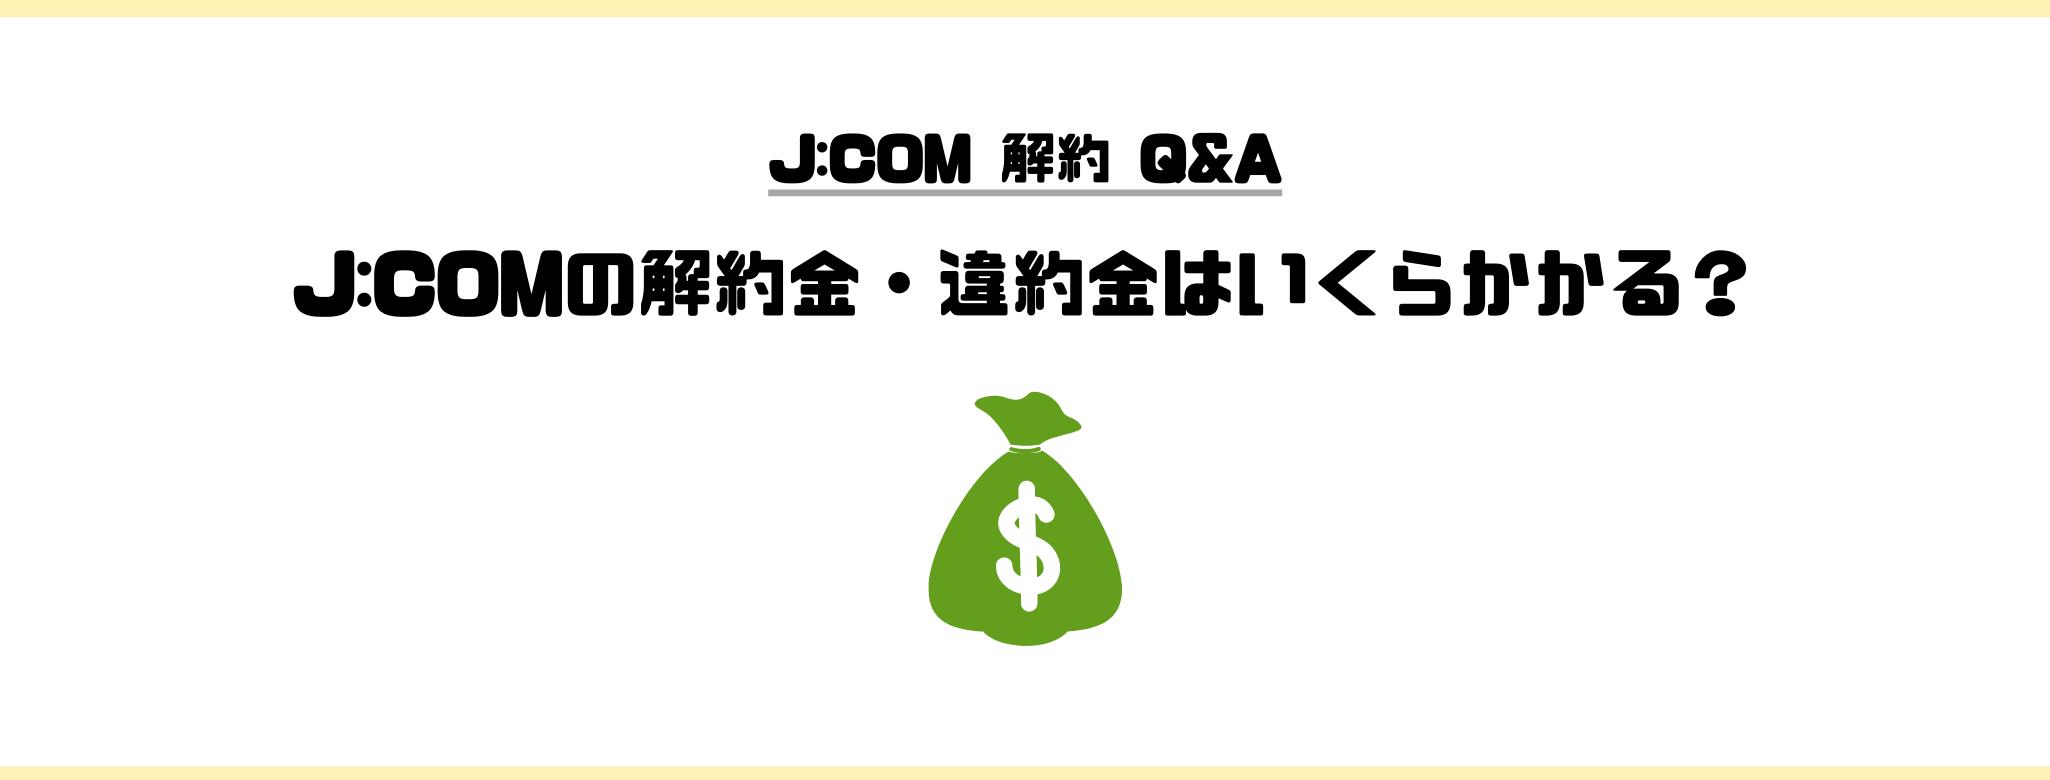 J:COM_解約_解約金_違約金